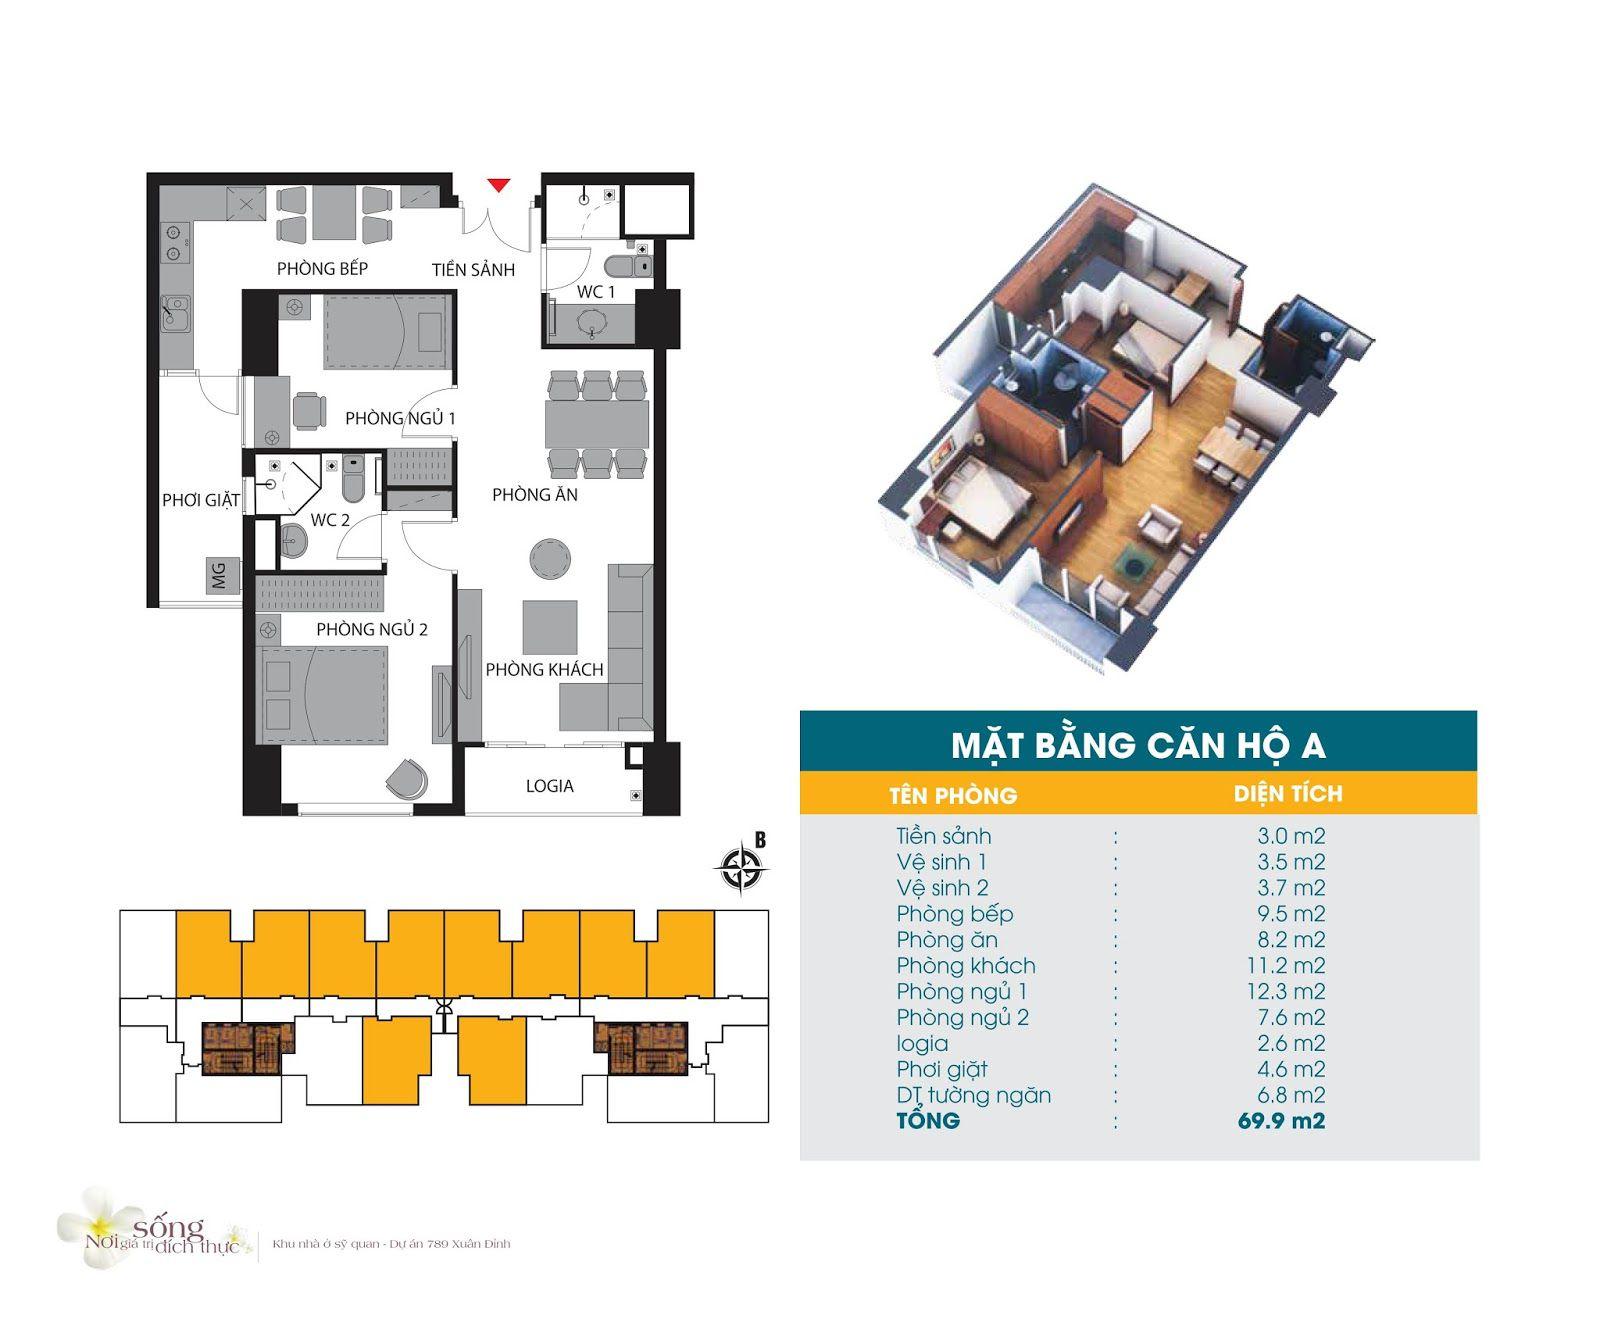 Căn hộ 69,9 m2